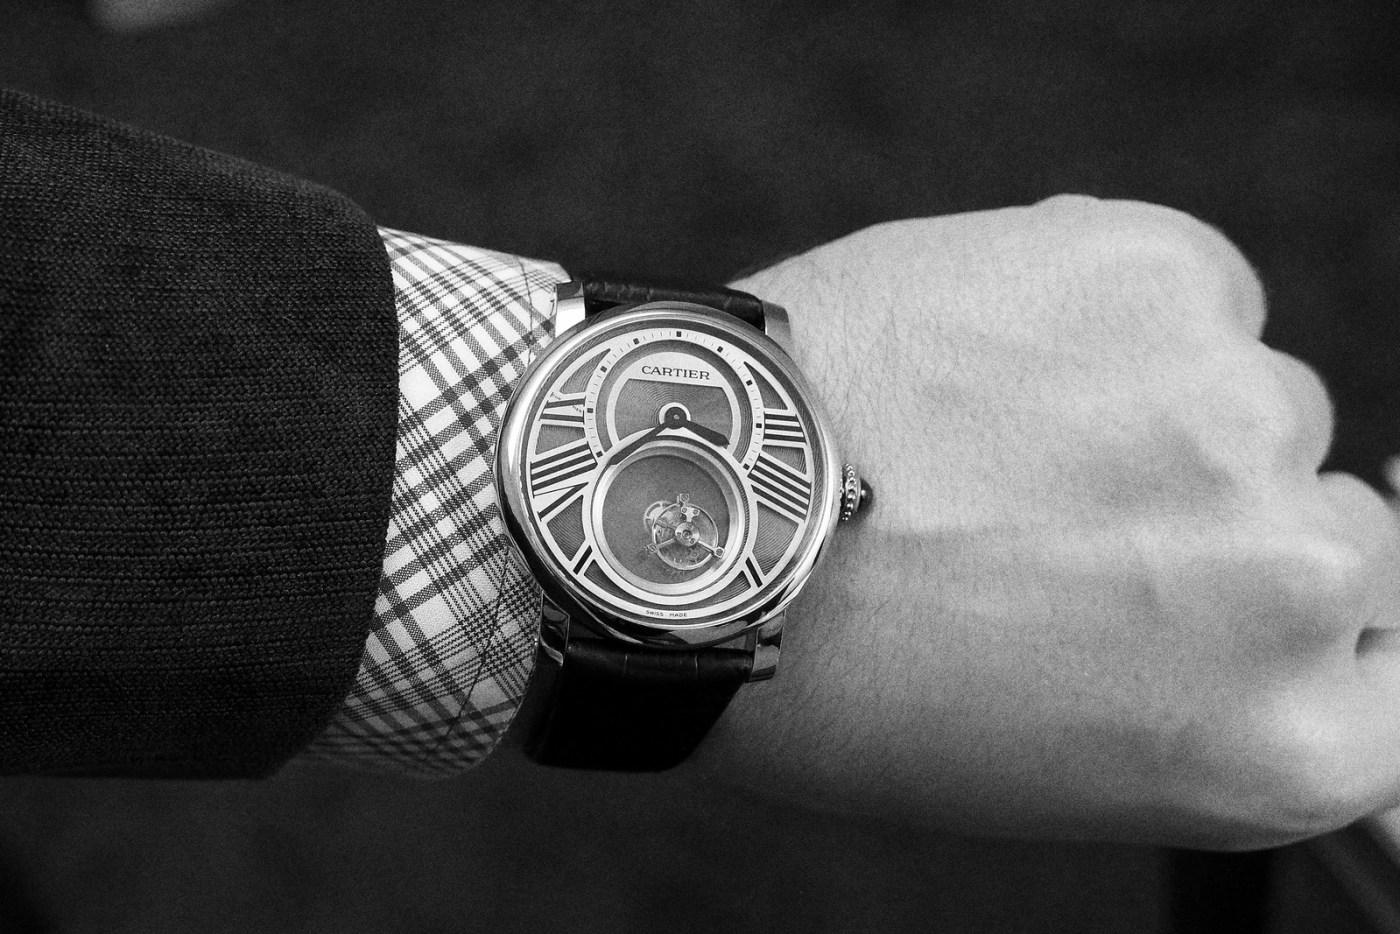 Cartier Mysterious wristshot